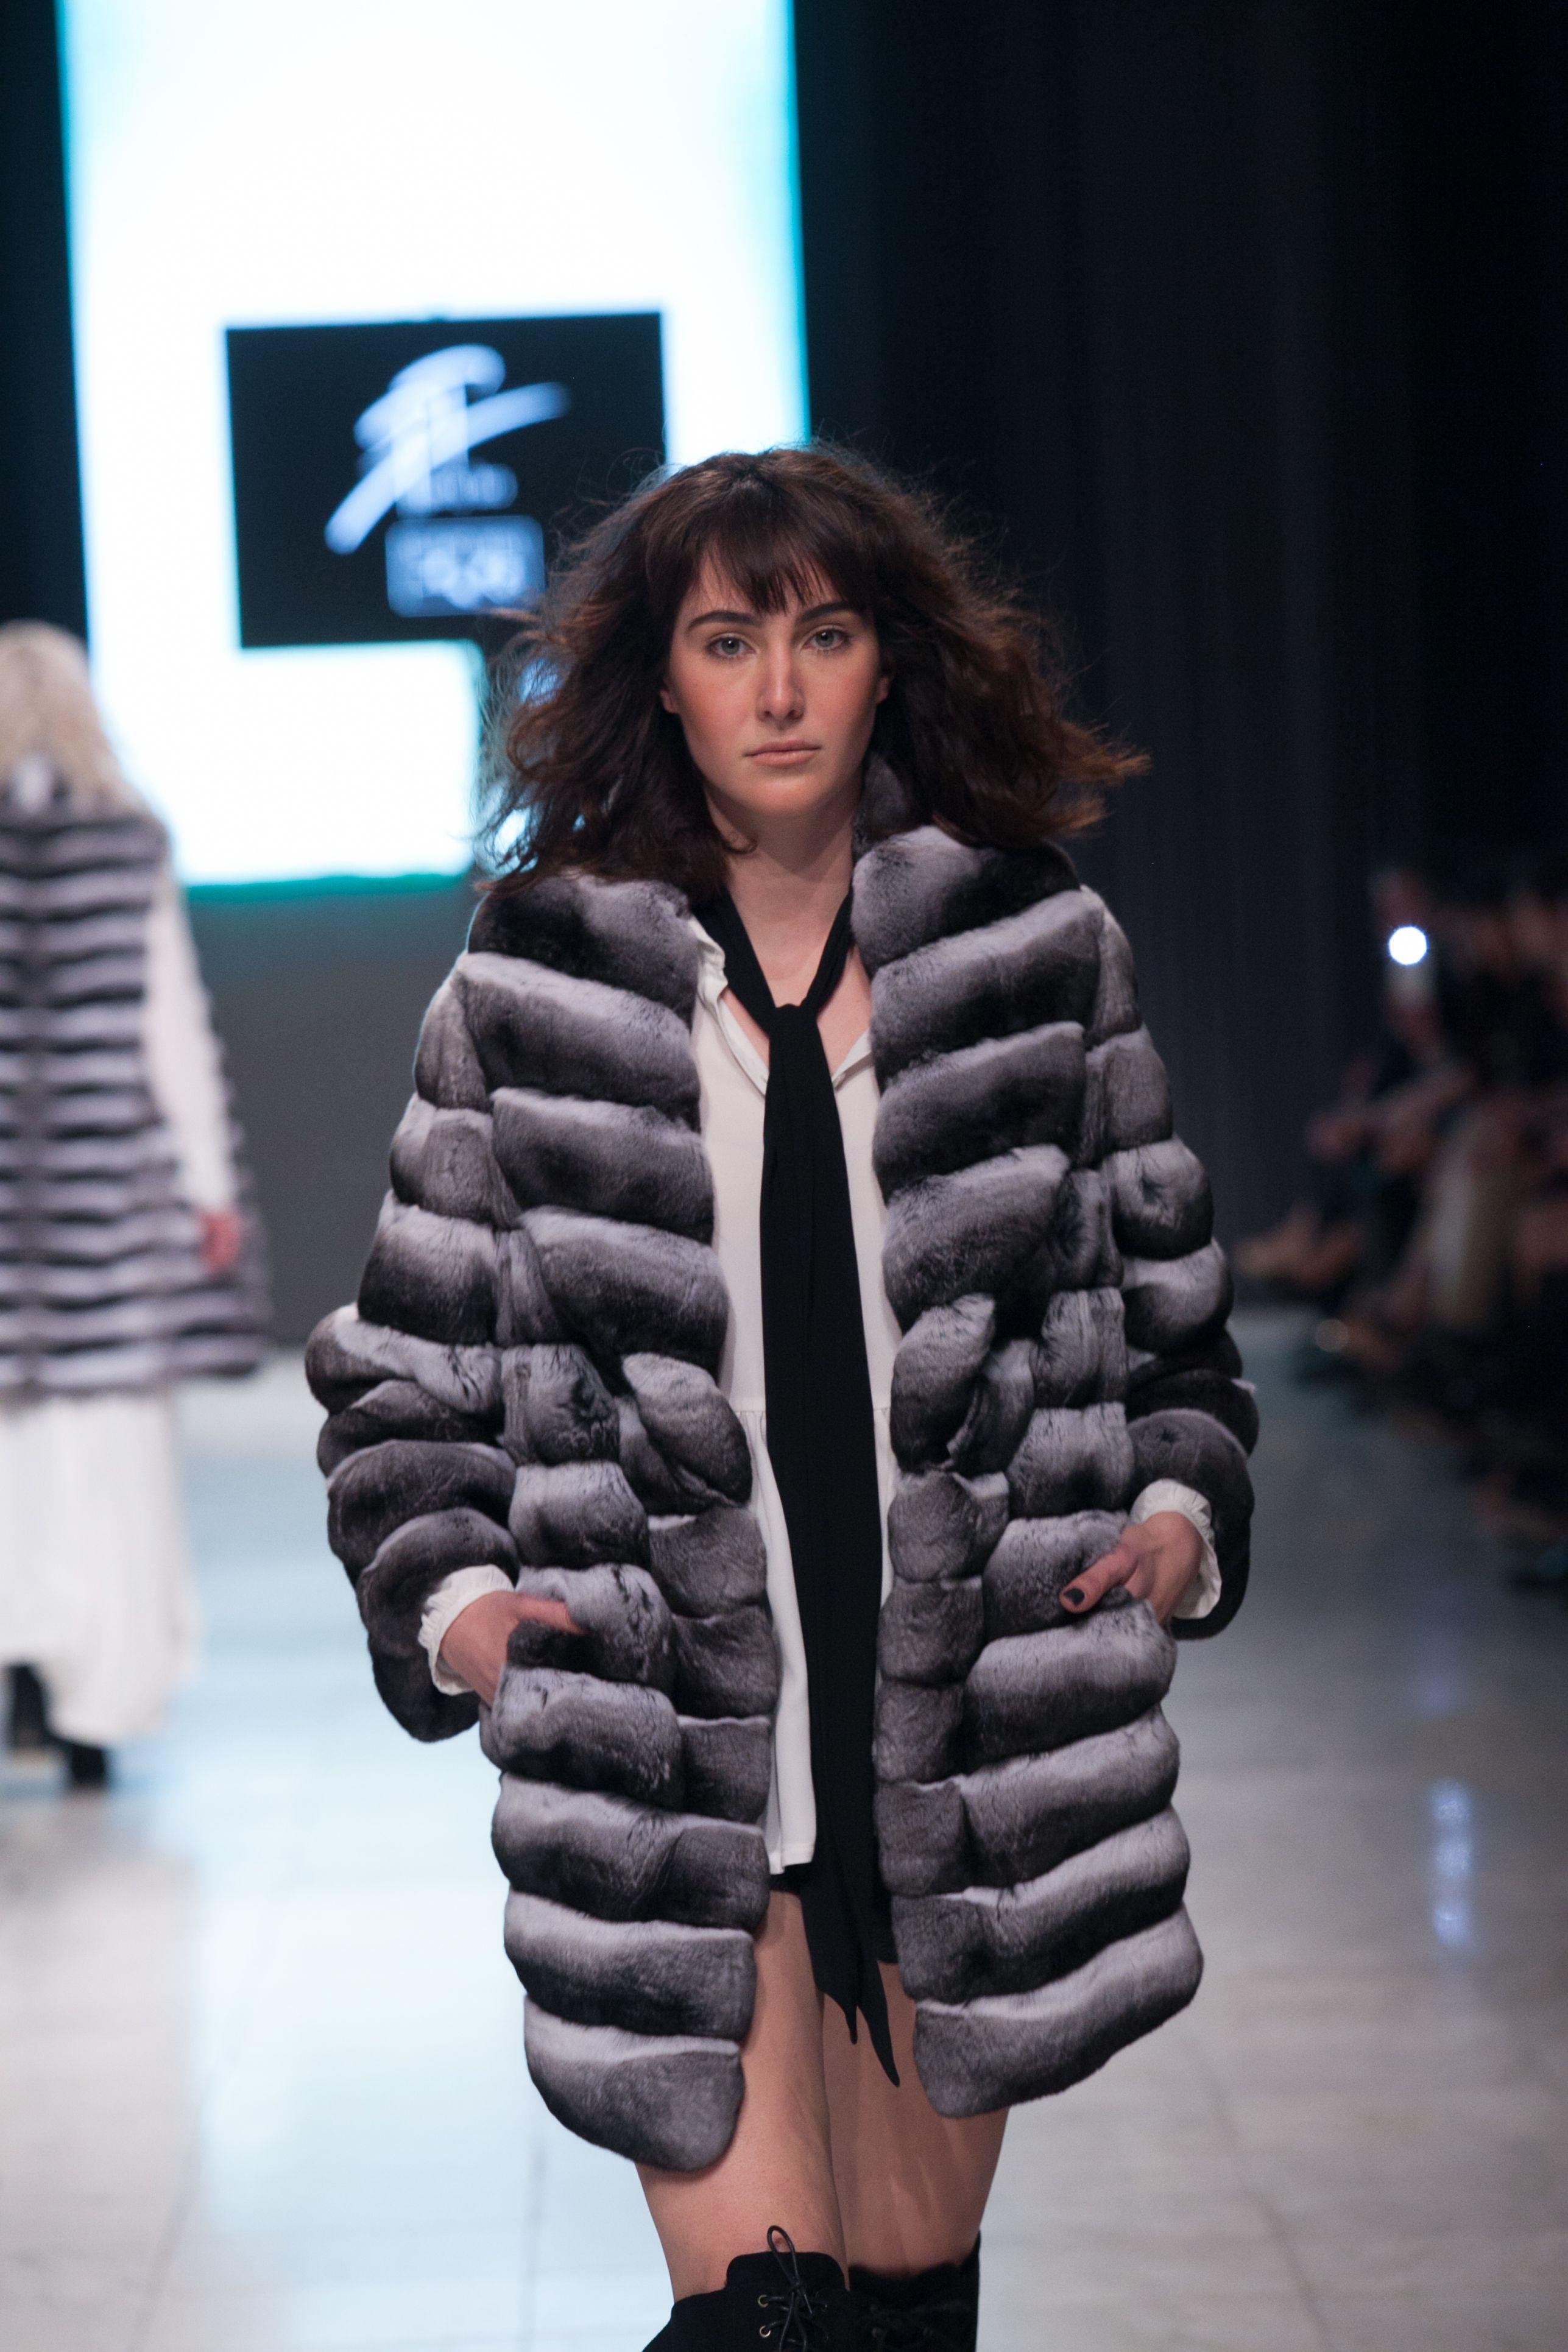 Catwalk: Black & White Chinchilla Fur Jacket. | PT Gala 2016 ...